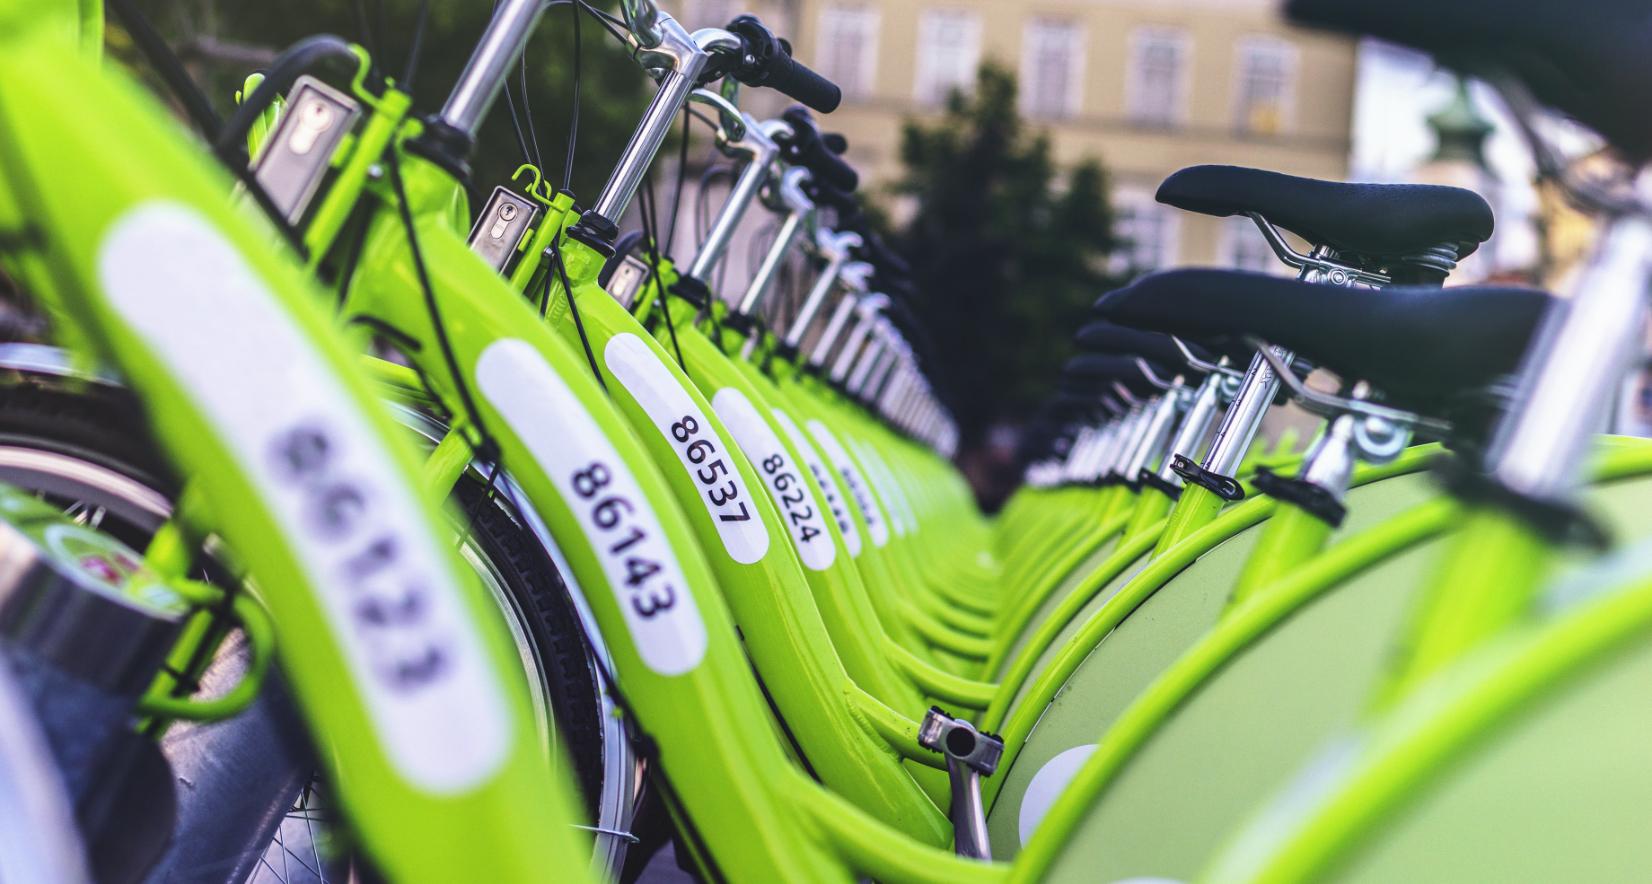 Shared bikes - Unsplash